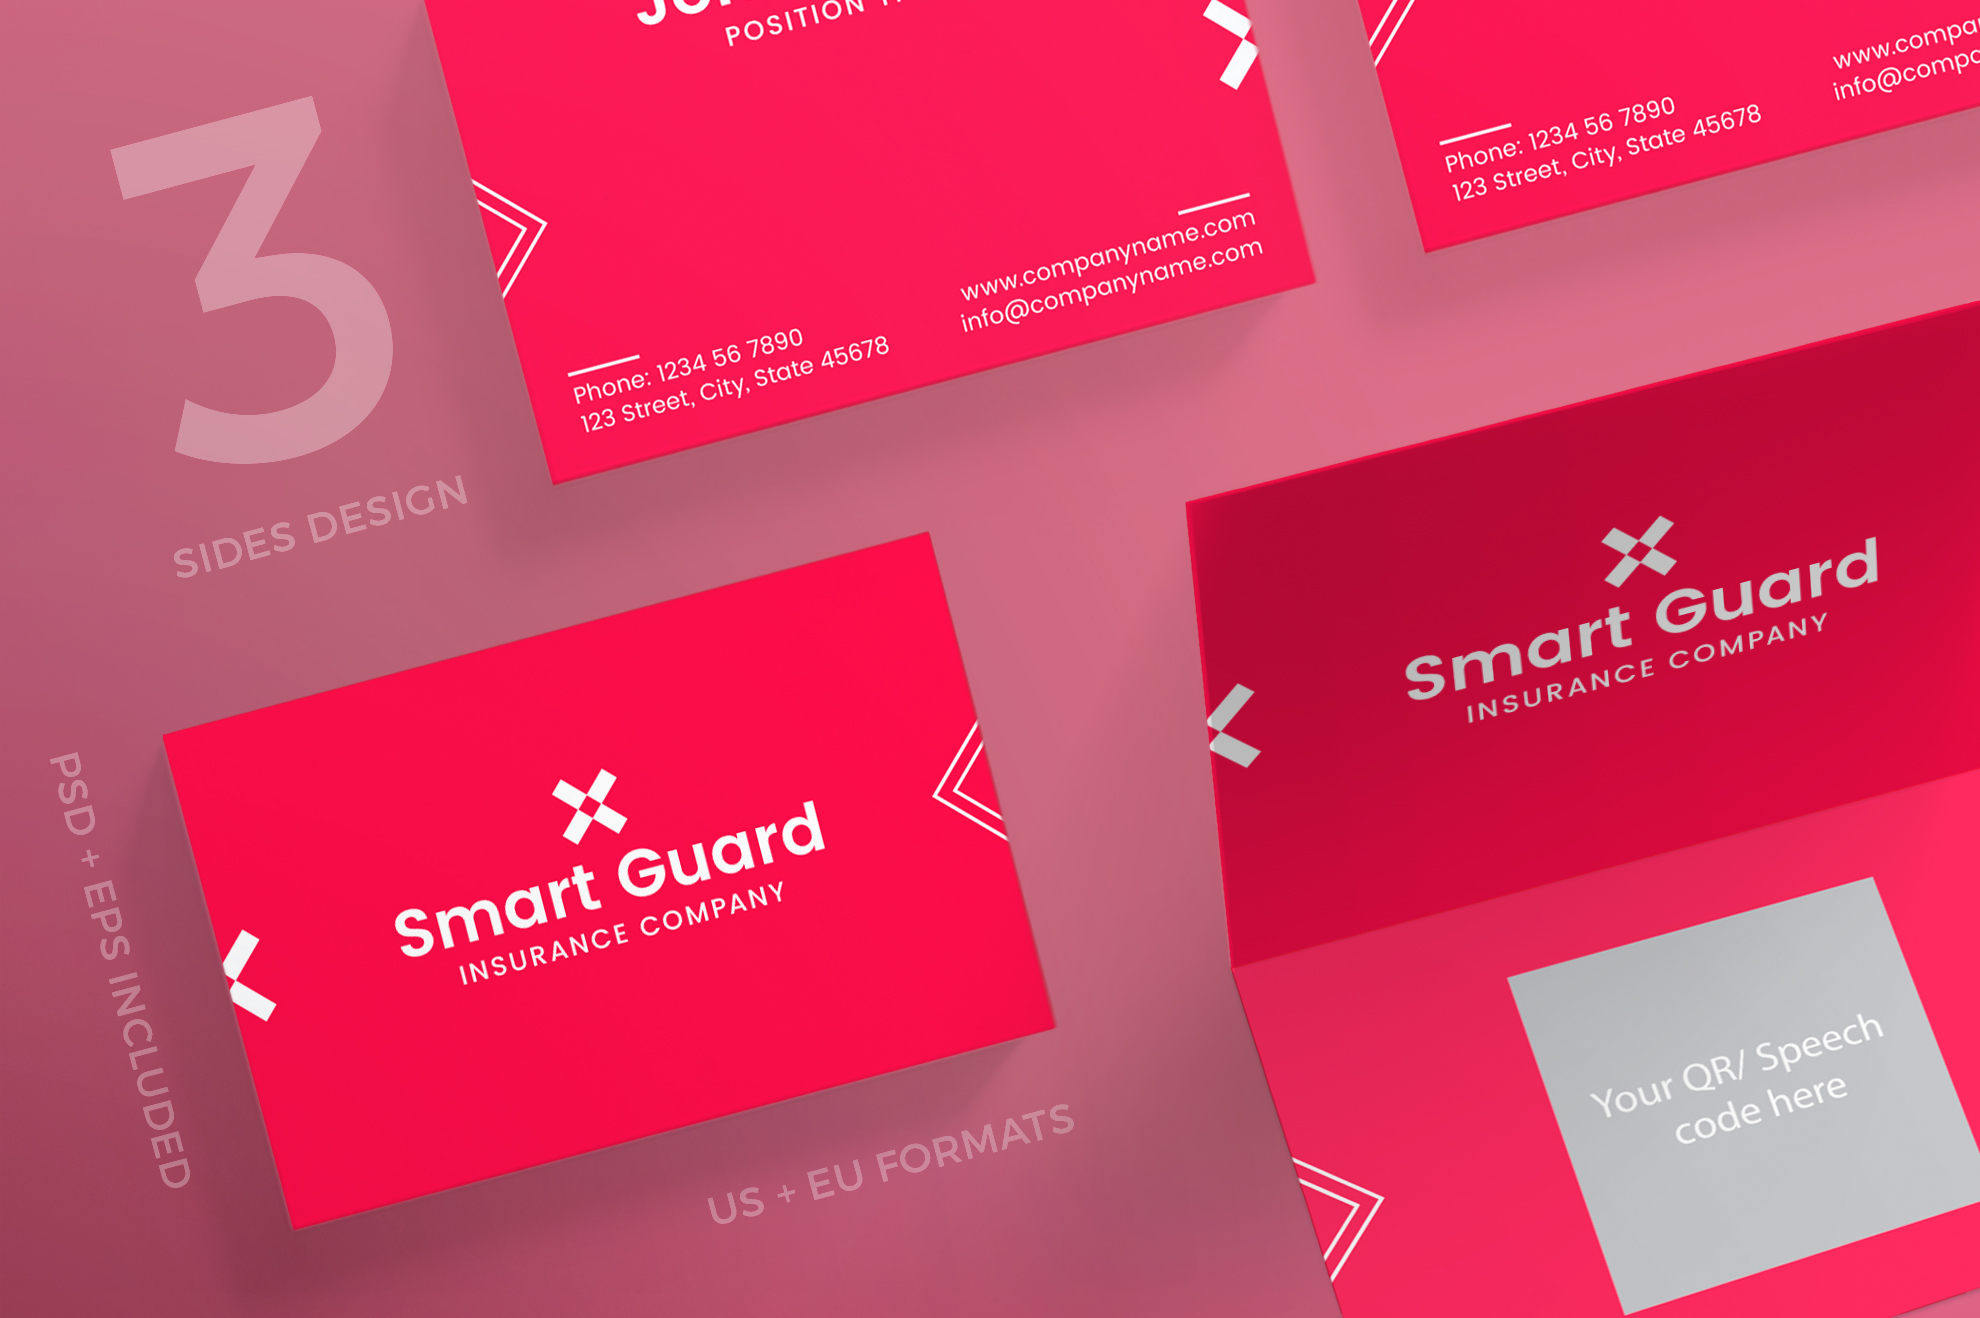 Insurance company business card design templates kit insurance company business card design templates kit example image 1 colourmoves